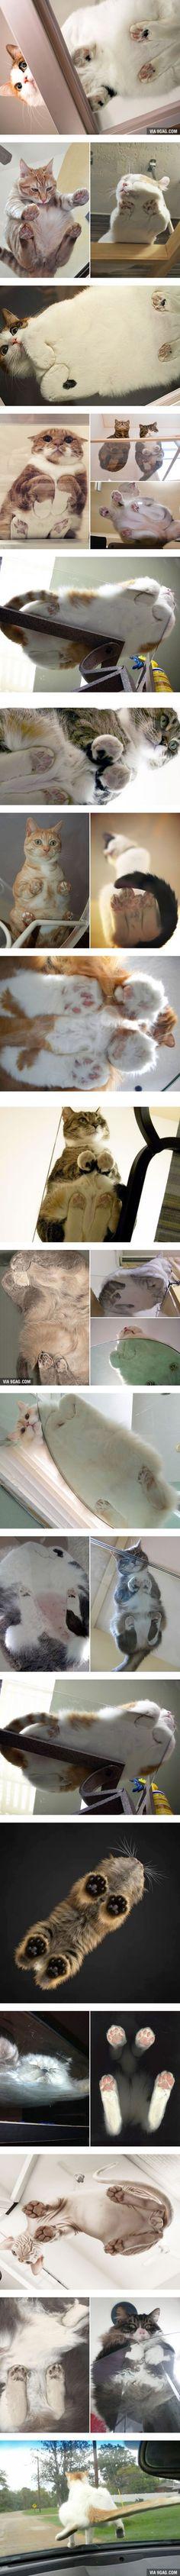 Cats vs Glass